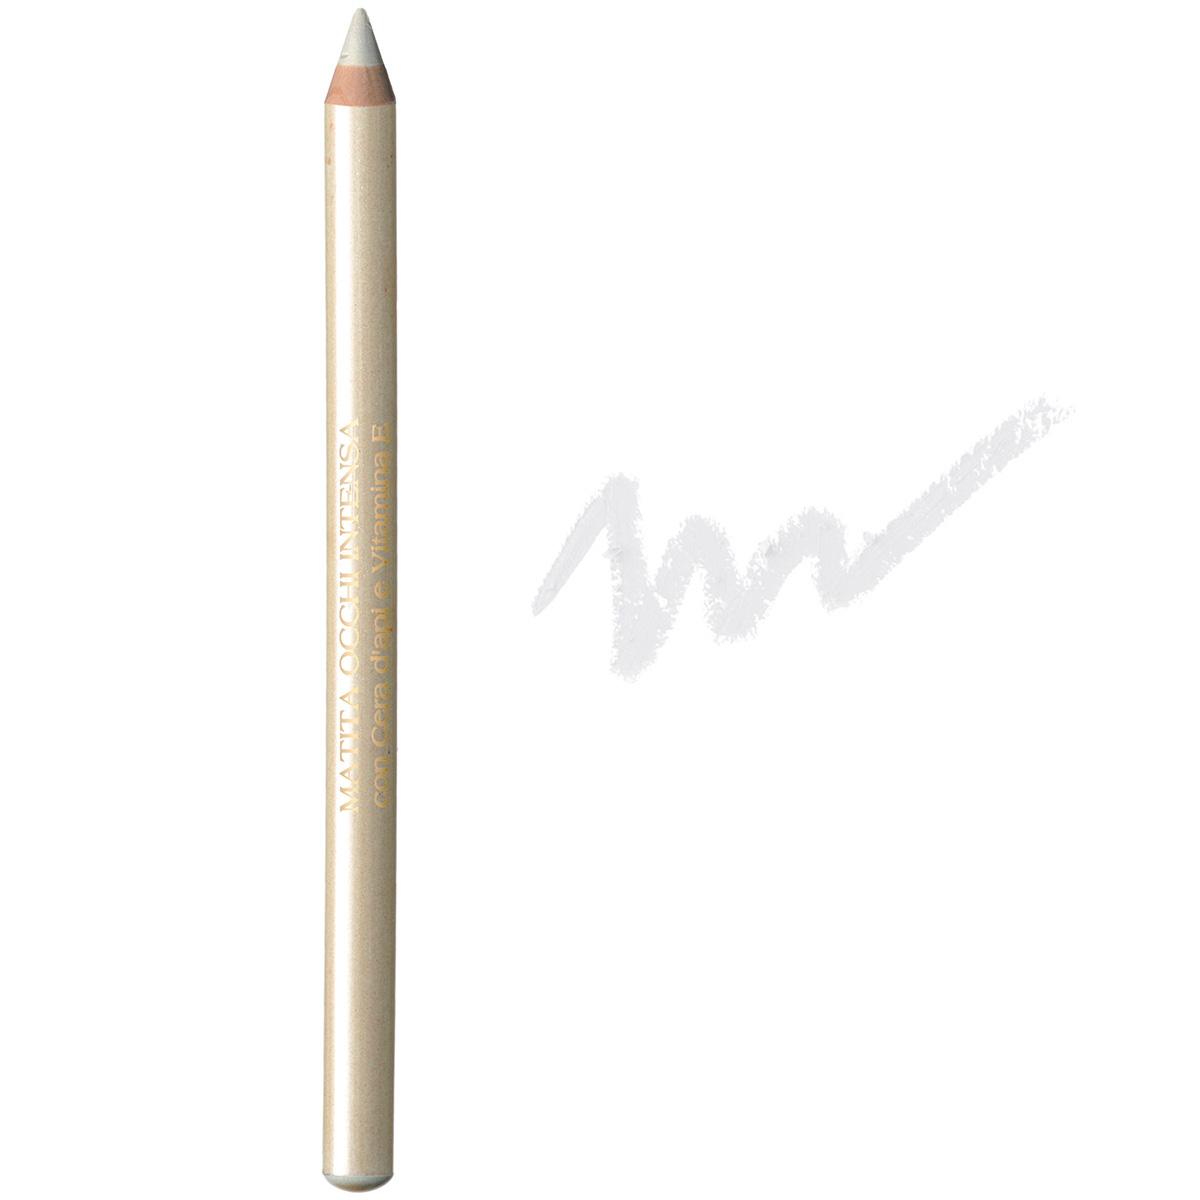 Creion de ochi contur intens cu ceara si vitamina E, perla, 8 G